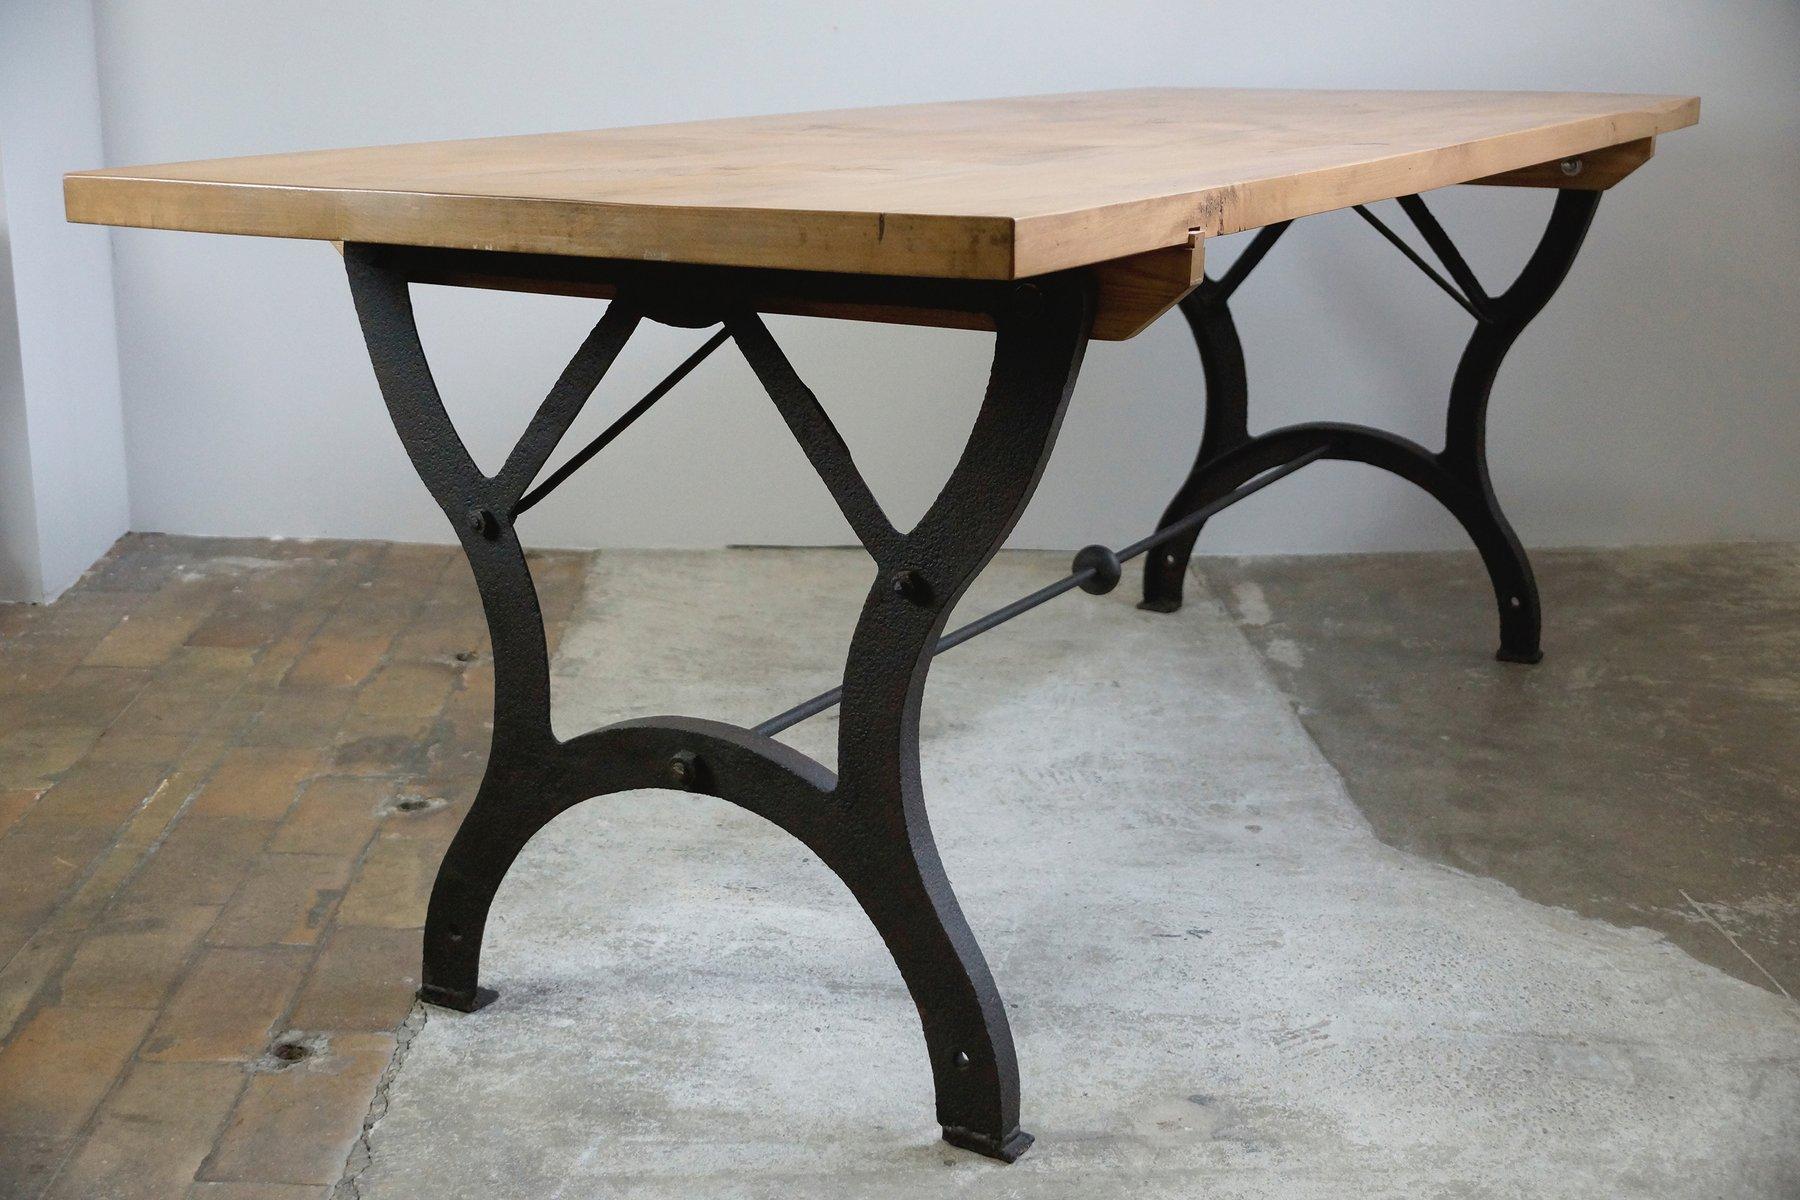 table de salle manger vintage industrielle en vente sur. Black Bedroom Furniture Sets. Home Design Ideas